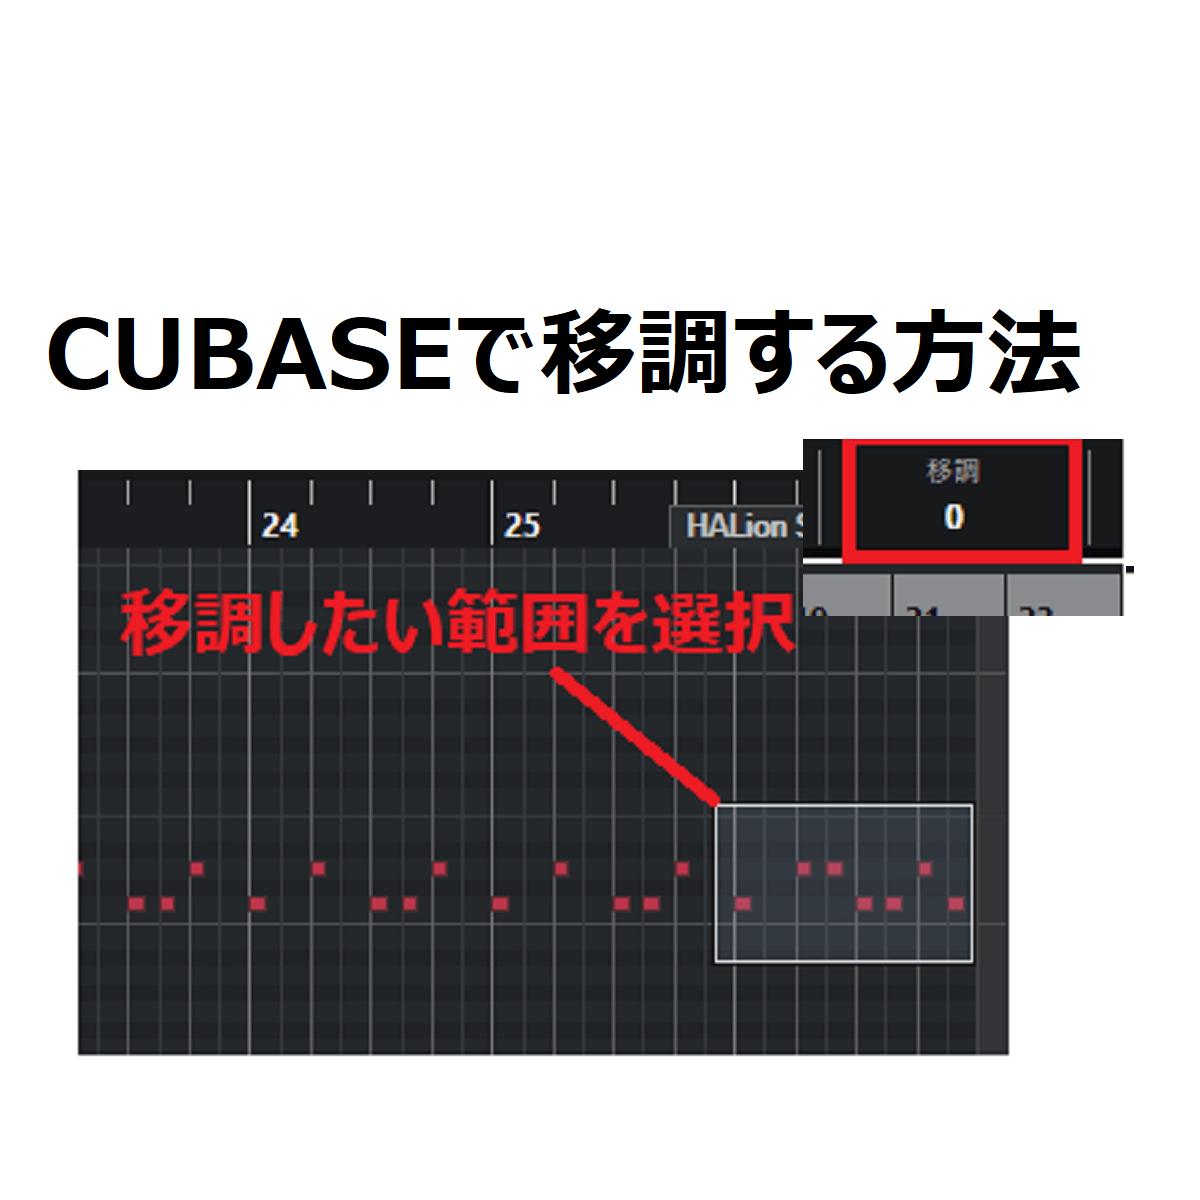 Cubaseの移調の設定画面。